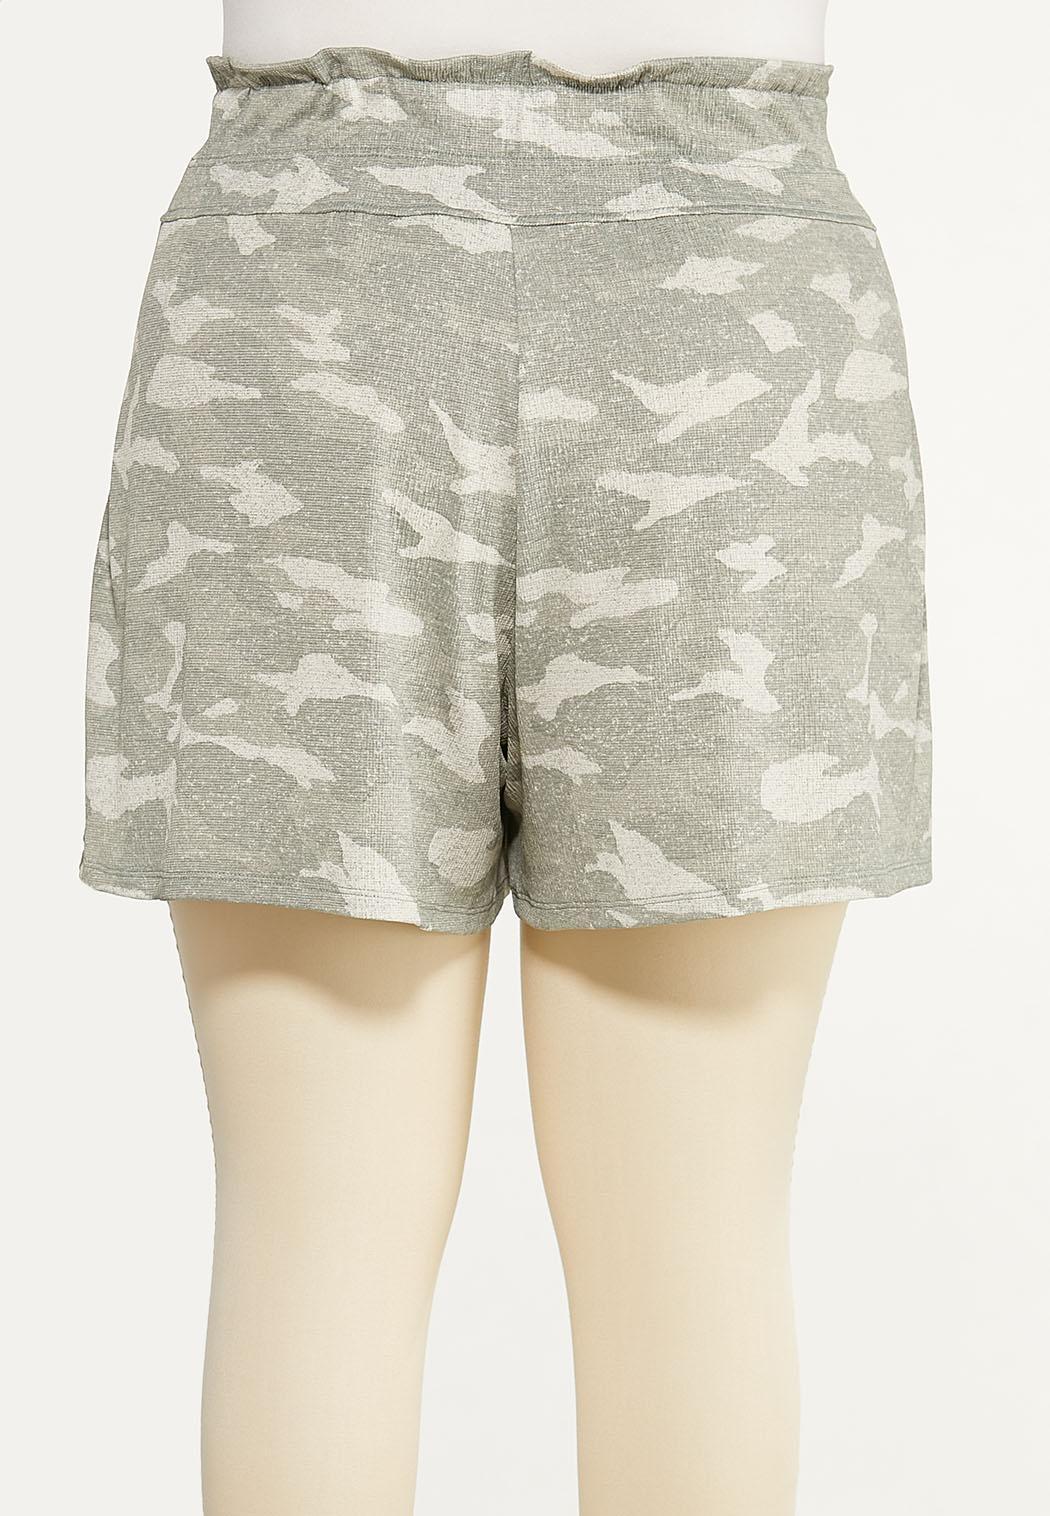 Plus Size Textured Camo Shorts (Item #44614782)